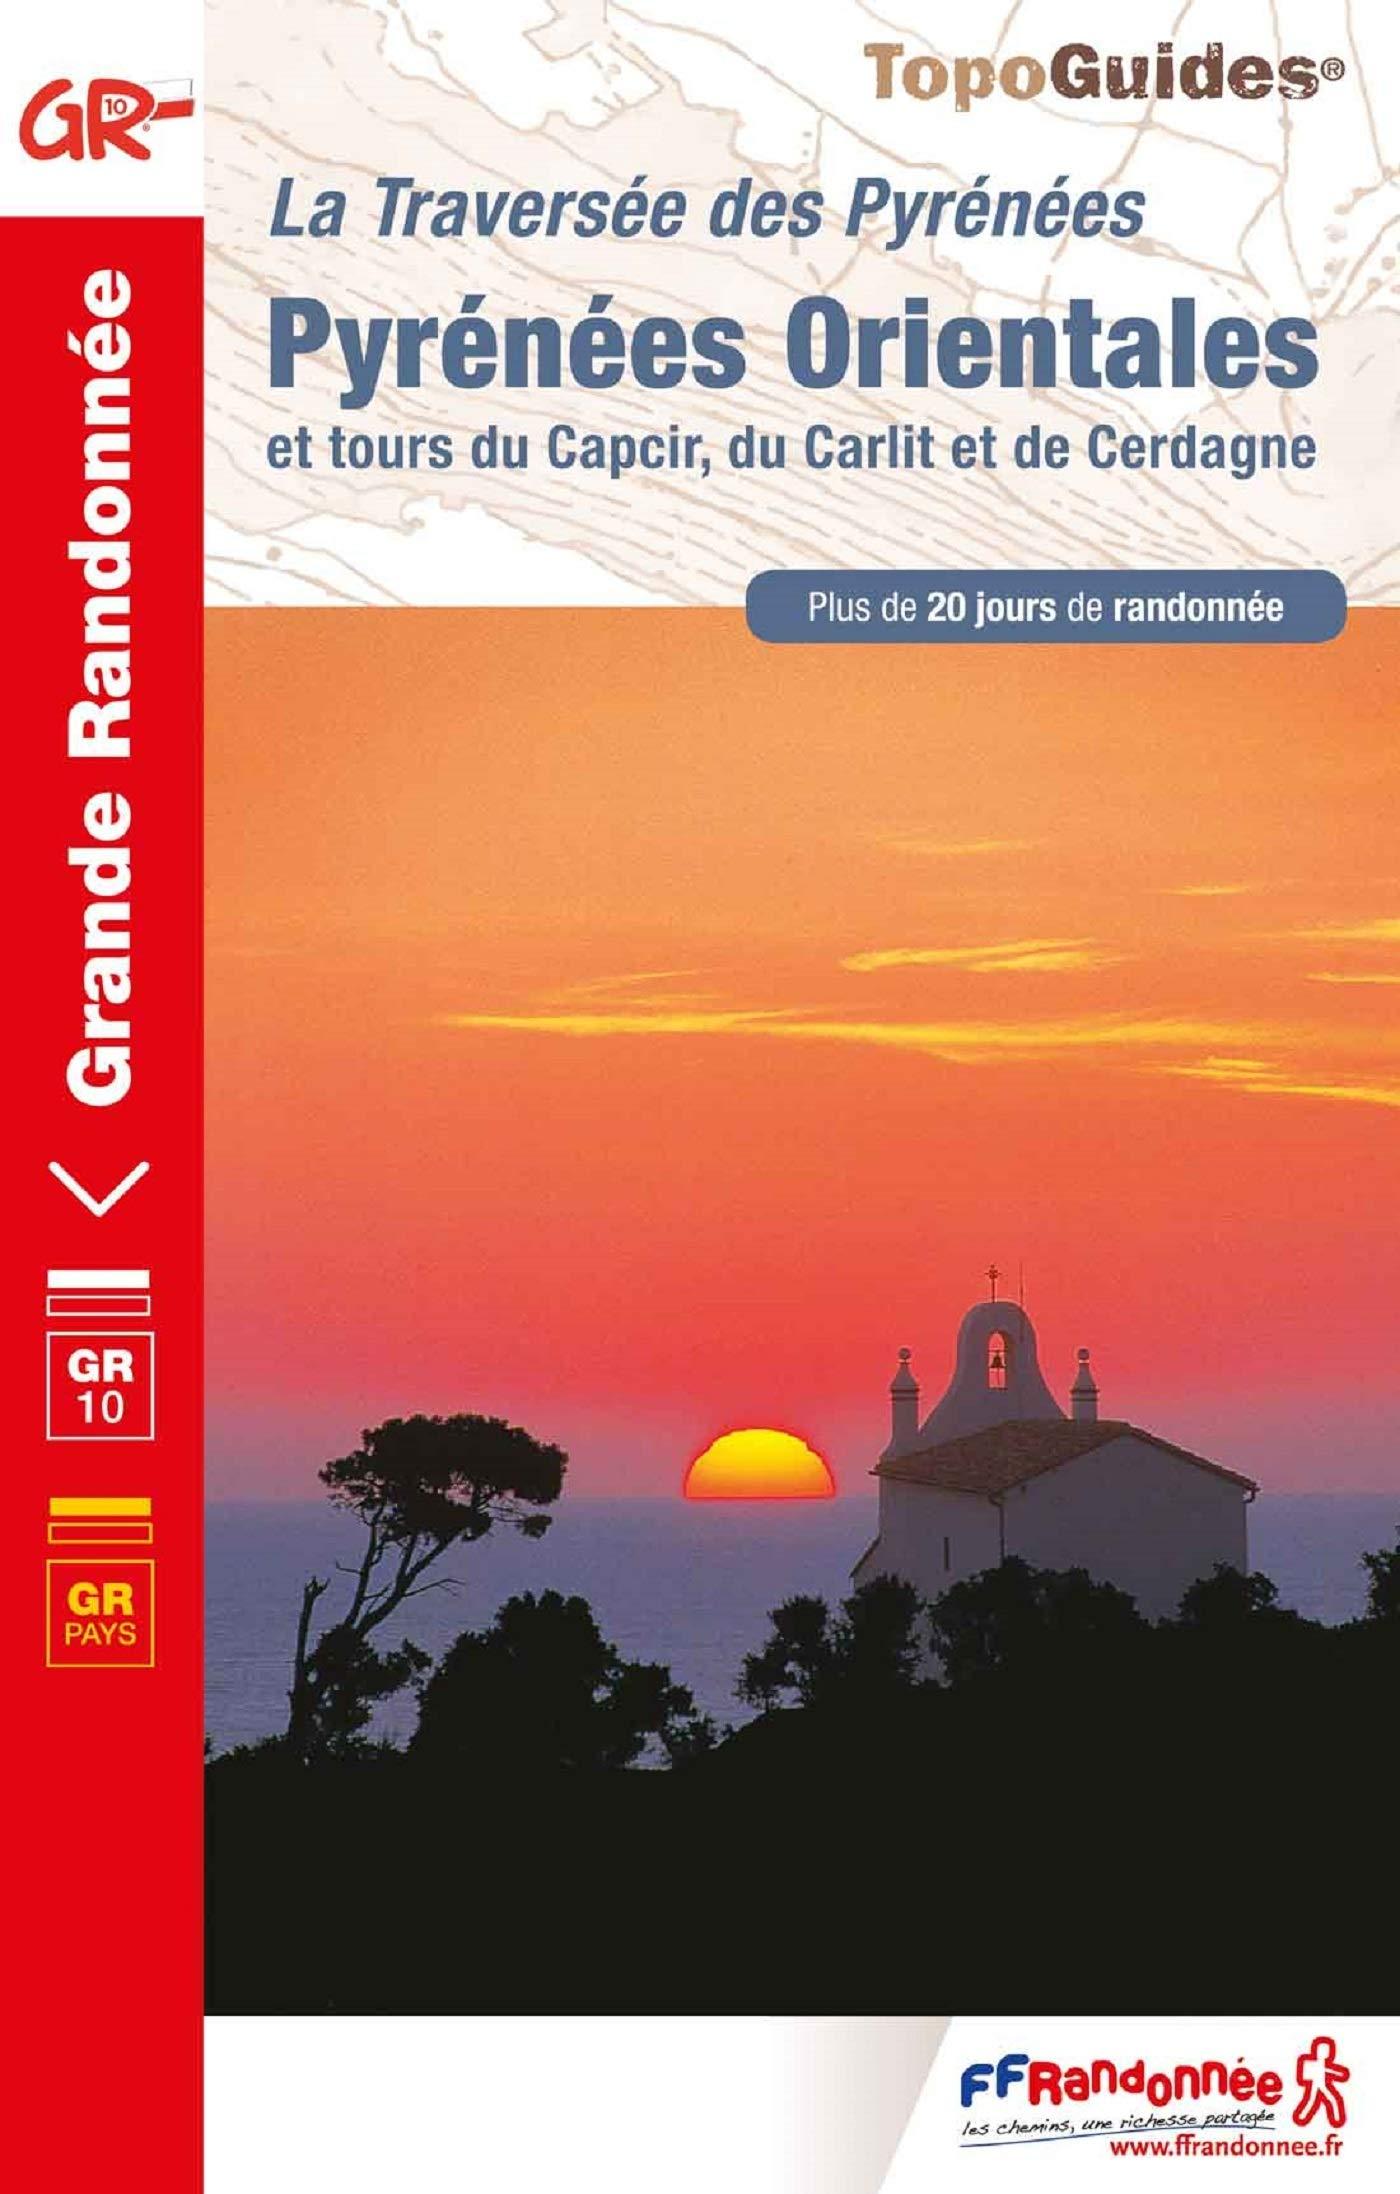 TG-1092  Pyrénées Orientales | wandelgids GR-10 9782751410208  FFRP Topoguides  Meerdaagse wandelroutes, Wandelgidsen Franse Pyreneeën